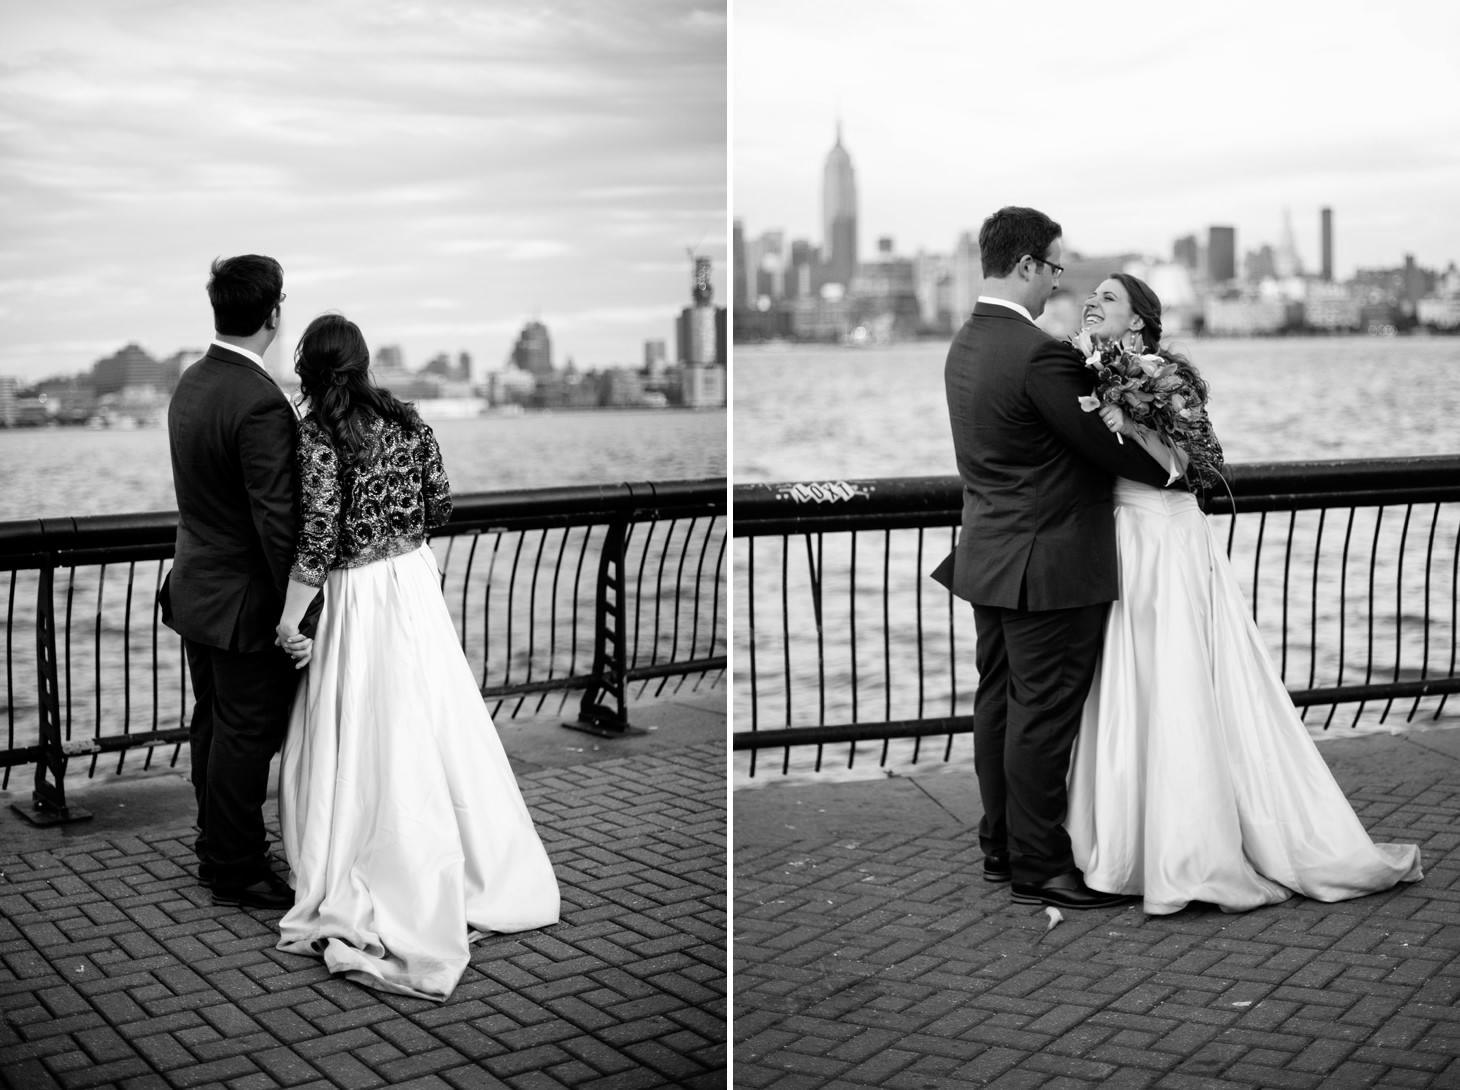 035-nyc-wedding-photographer-hoboken-waterfront-wedding-photos-smitten-chickens.jpg